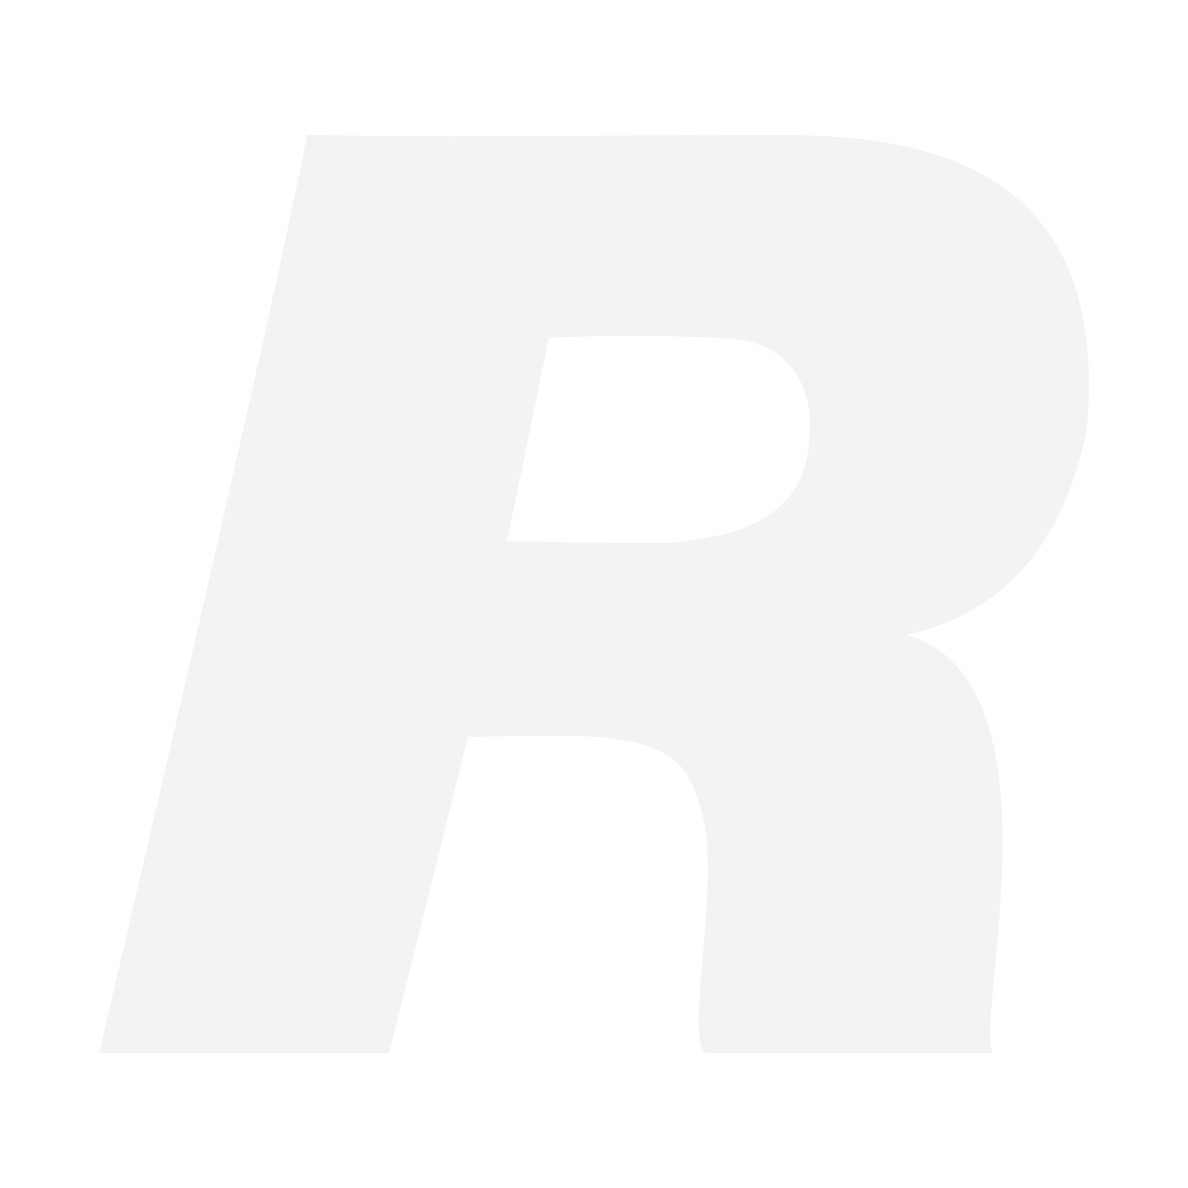 SAMYANG SAL 85mm f/1.4 AS UMC KÄYTETTY